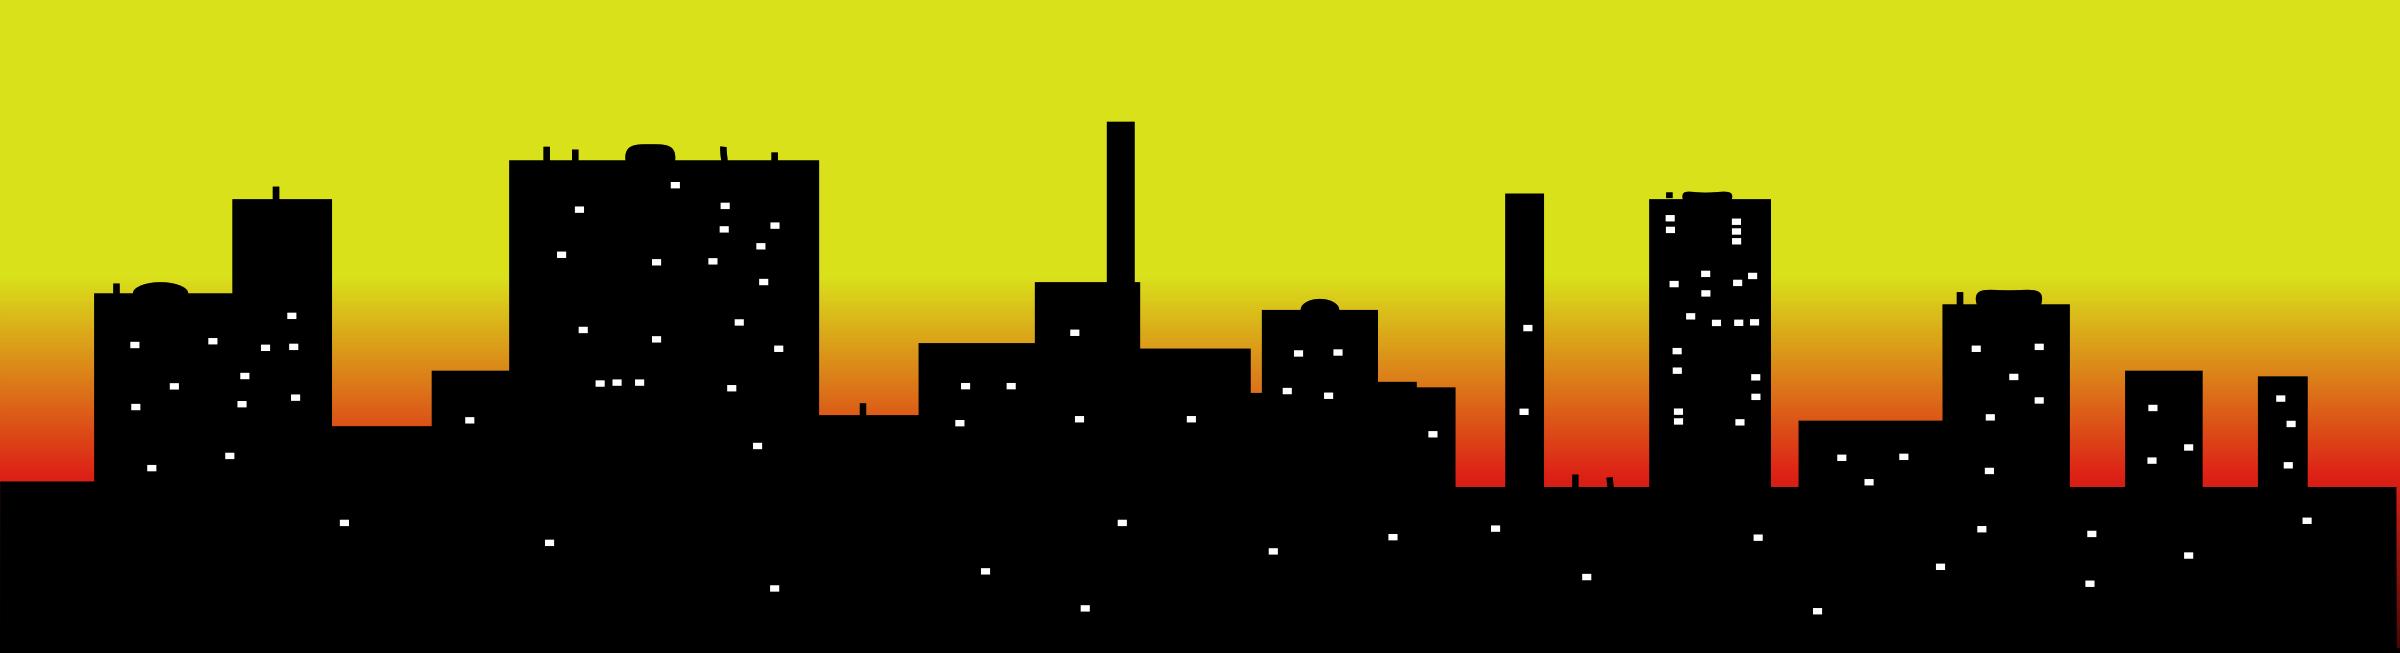 Neighborhood clipart skyline.  collection of city